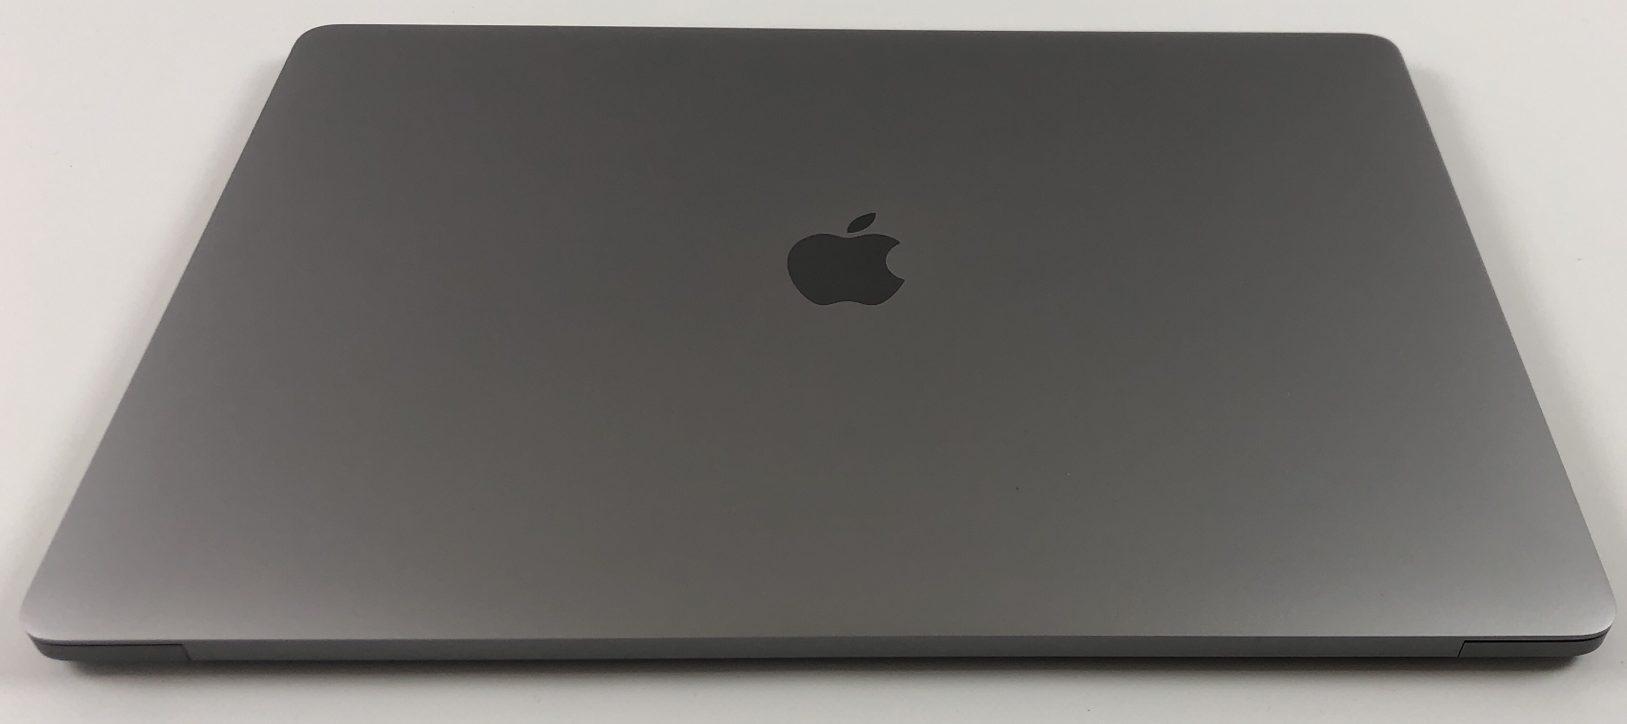 "MacBook Pro 15"" Touch Bar Mid 2017 (Intel Quad-Core i7 3.1 GHz 16 GB RAM 1 TB SSD), Space Gray, Intel Quad-Core i7 3.1 GHz, 16 GB RAM, 1 TB SSD, image 2"